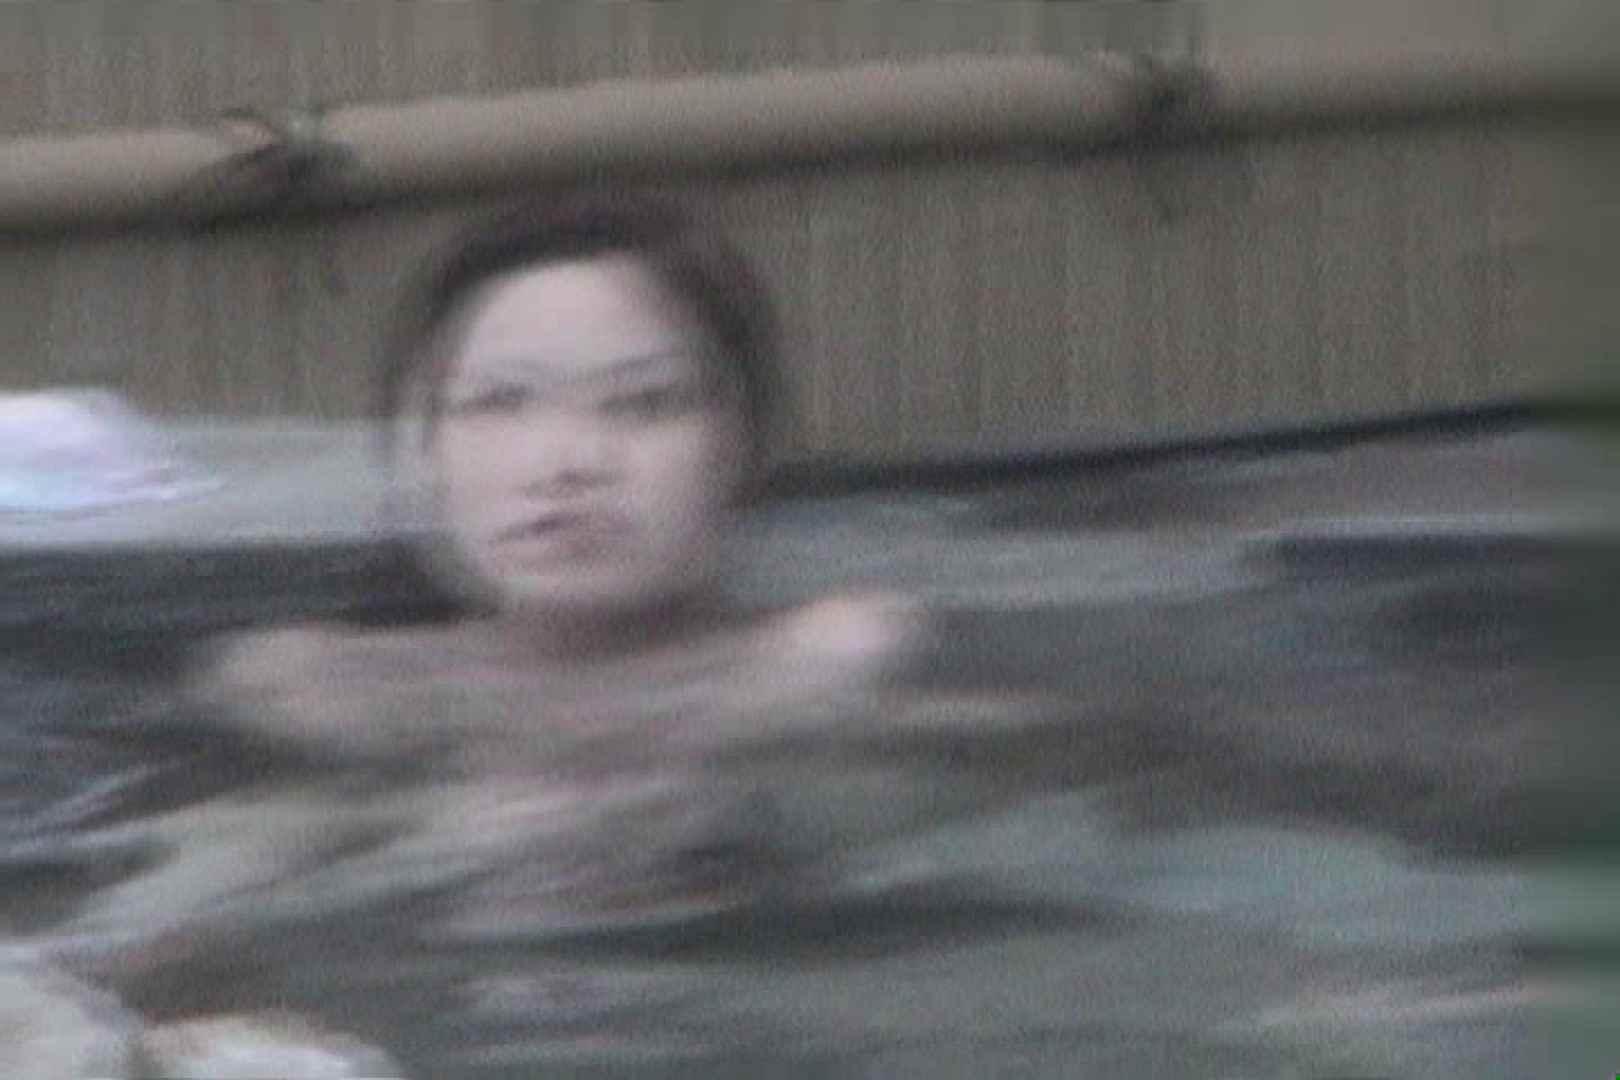 Aquaな露天風呂Vol.602 露天風呂編  83PIX 34